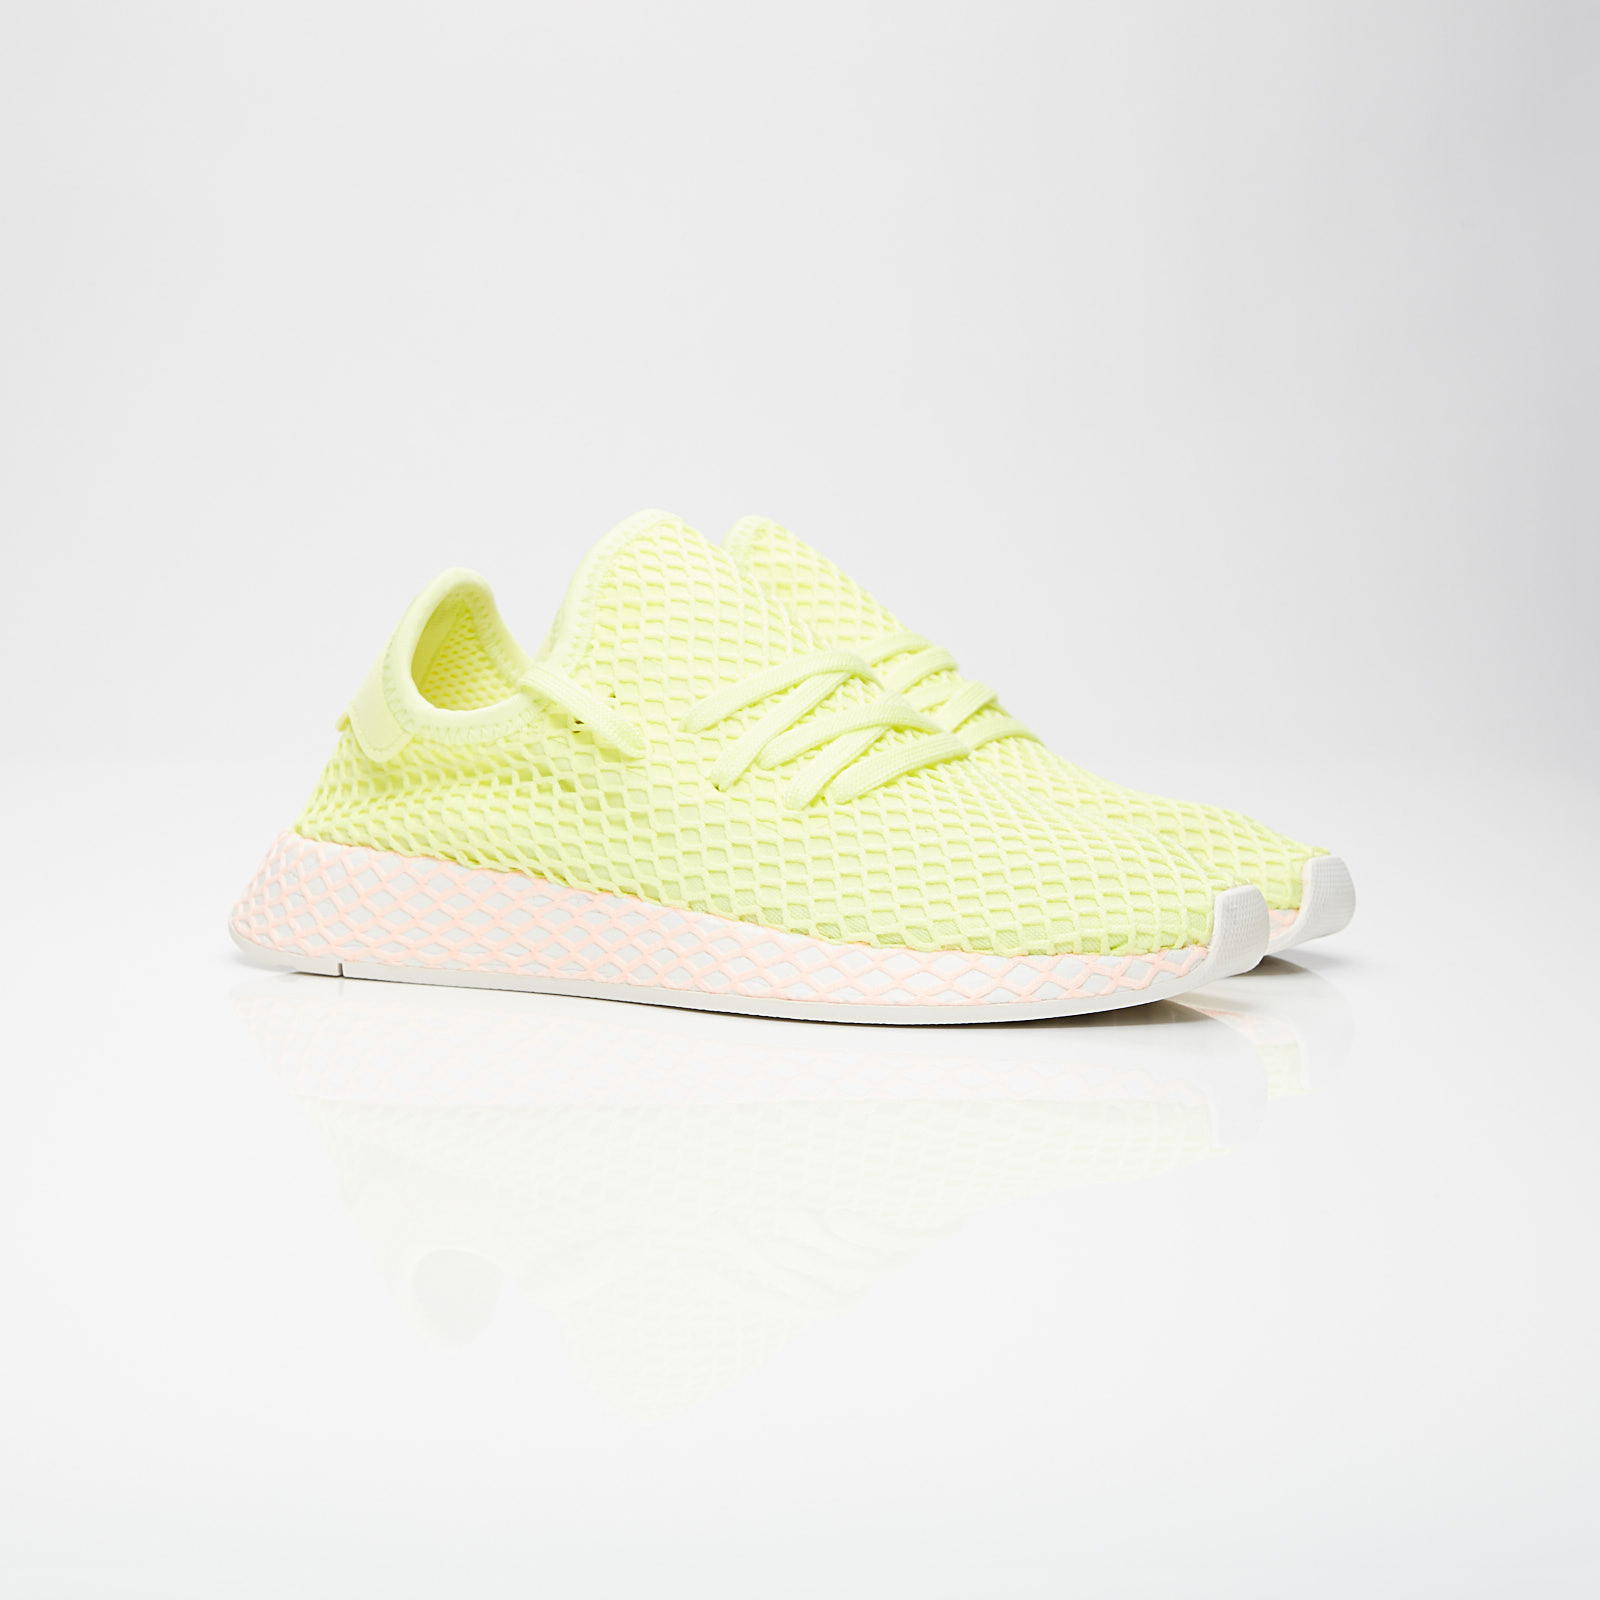 00935749e097d adidas Deerupt W - B37599 - Sneakersnstuff